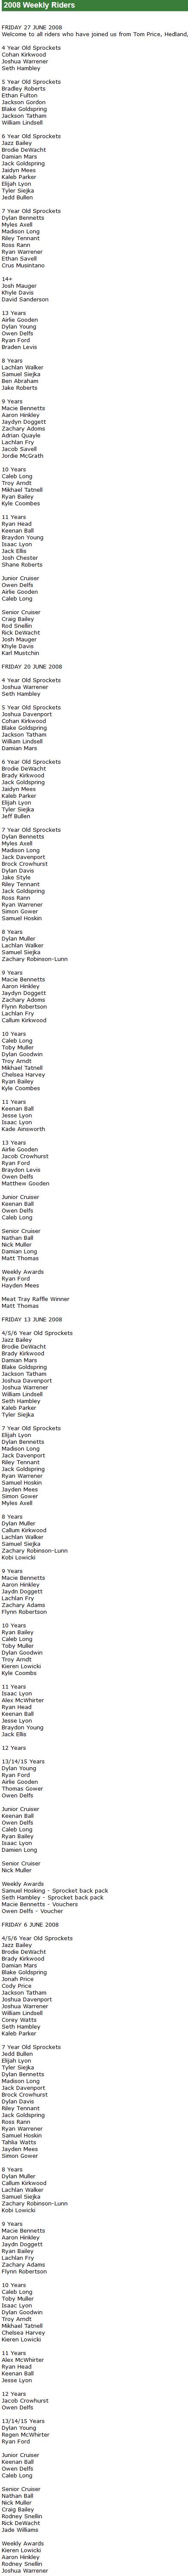 2008 Karratha BMX Club Weekly Riders.png